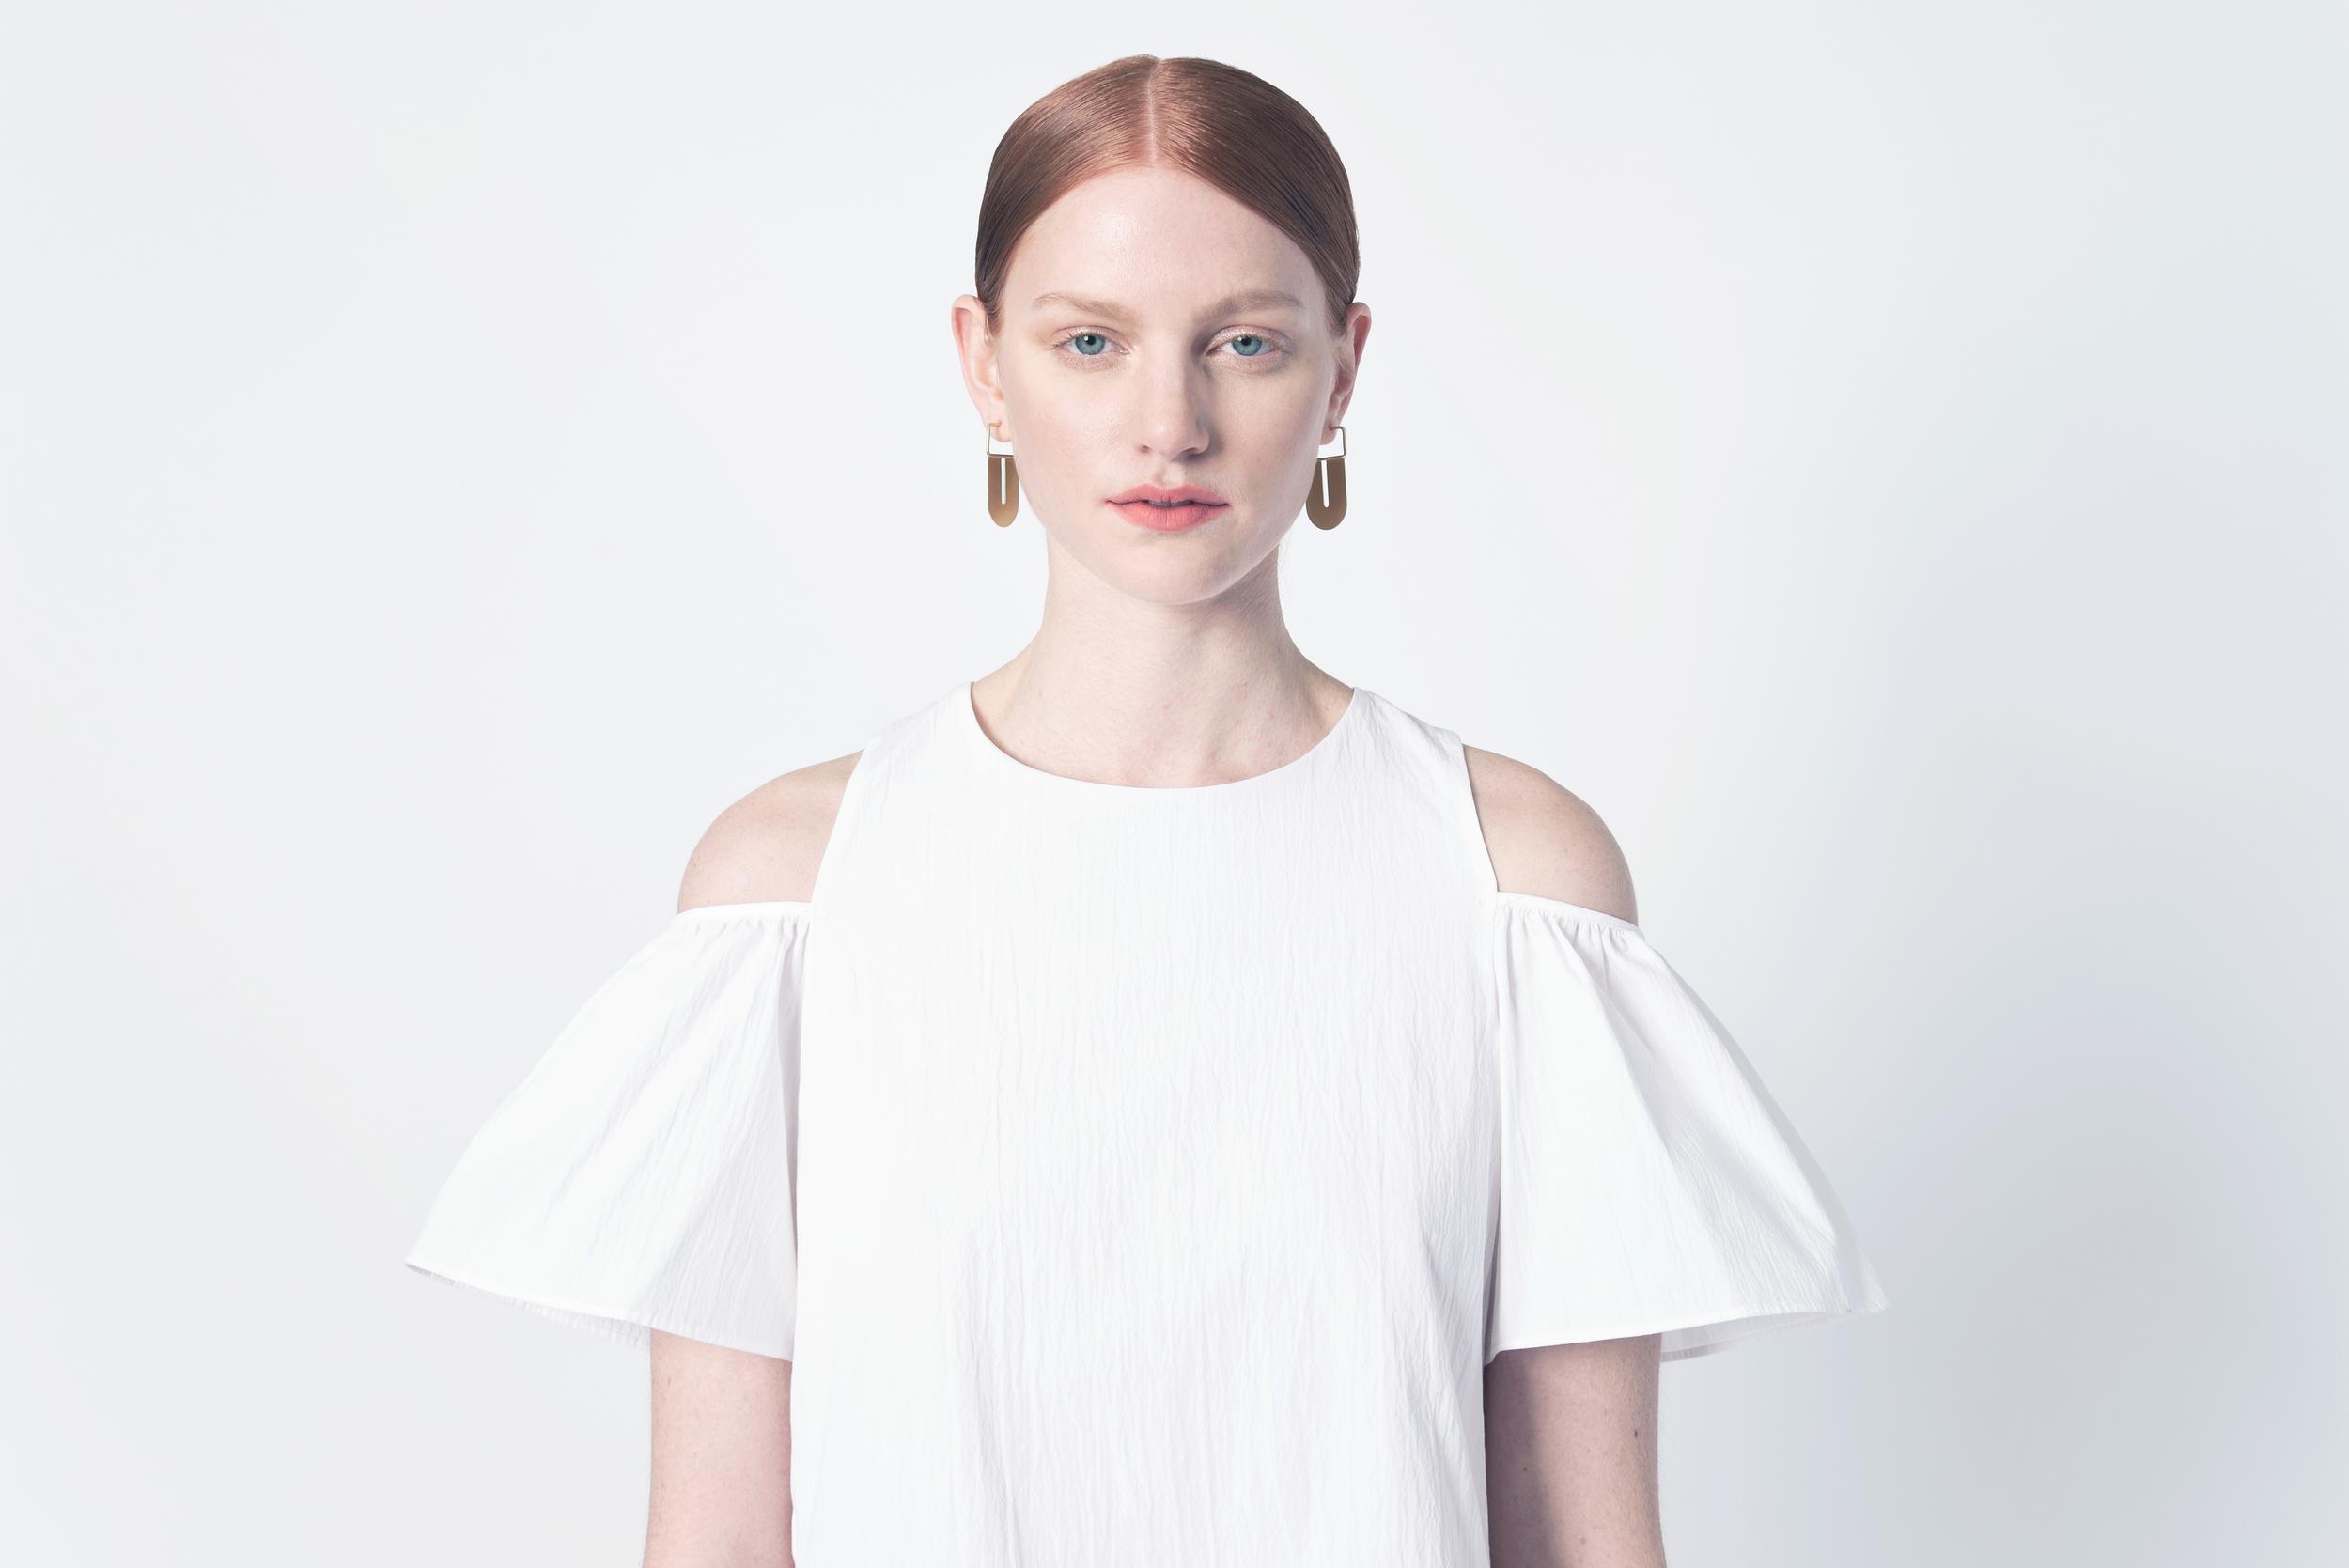 Natalie Joy's Stream/Line Collection